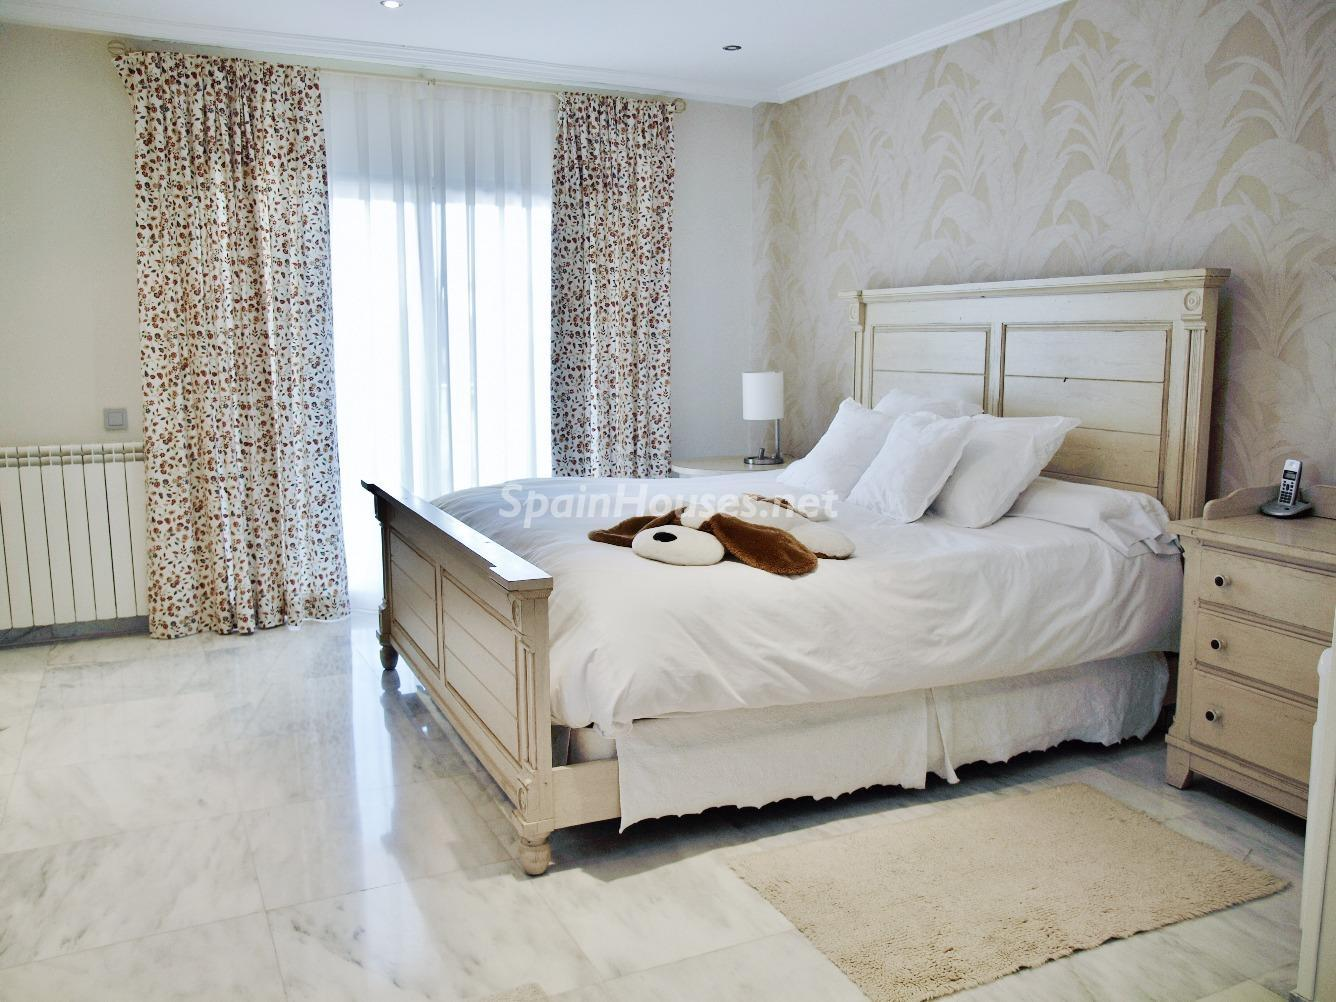 14. House for sale in Las Rozas de Madrid Madrid 1 - Exclusive 7 Bedroom Villa for Sale in Las Rozas de Madrid